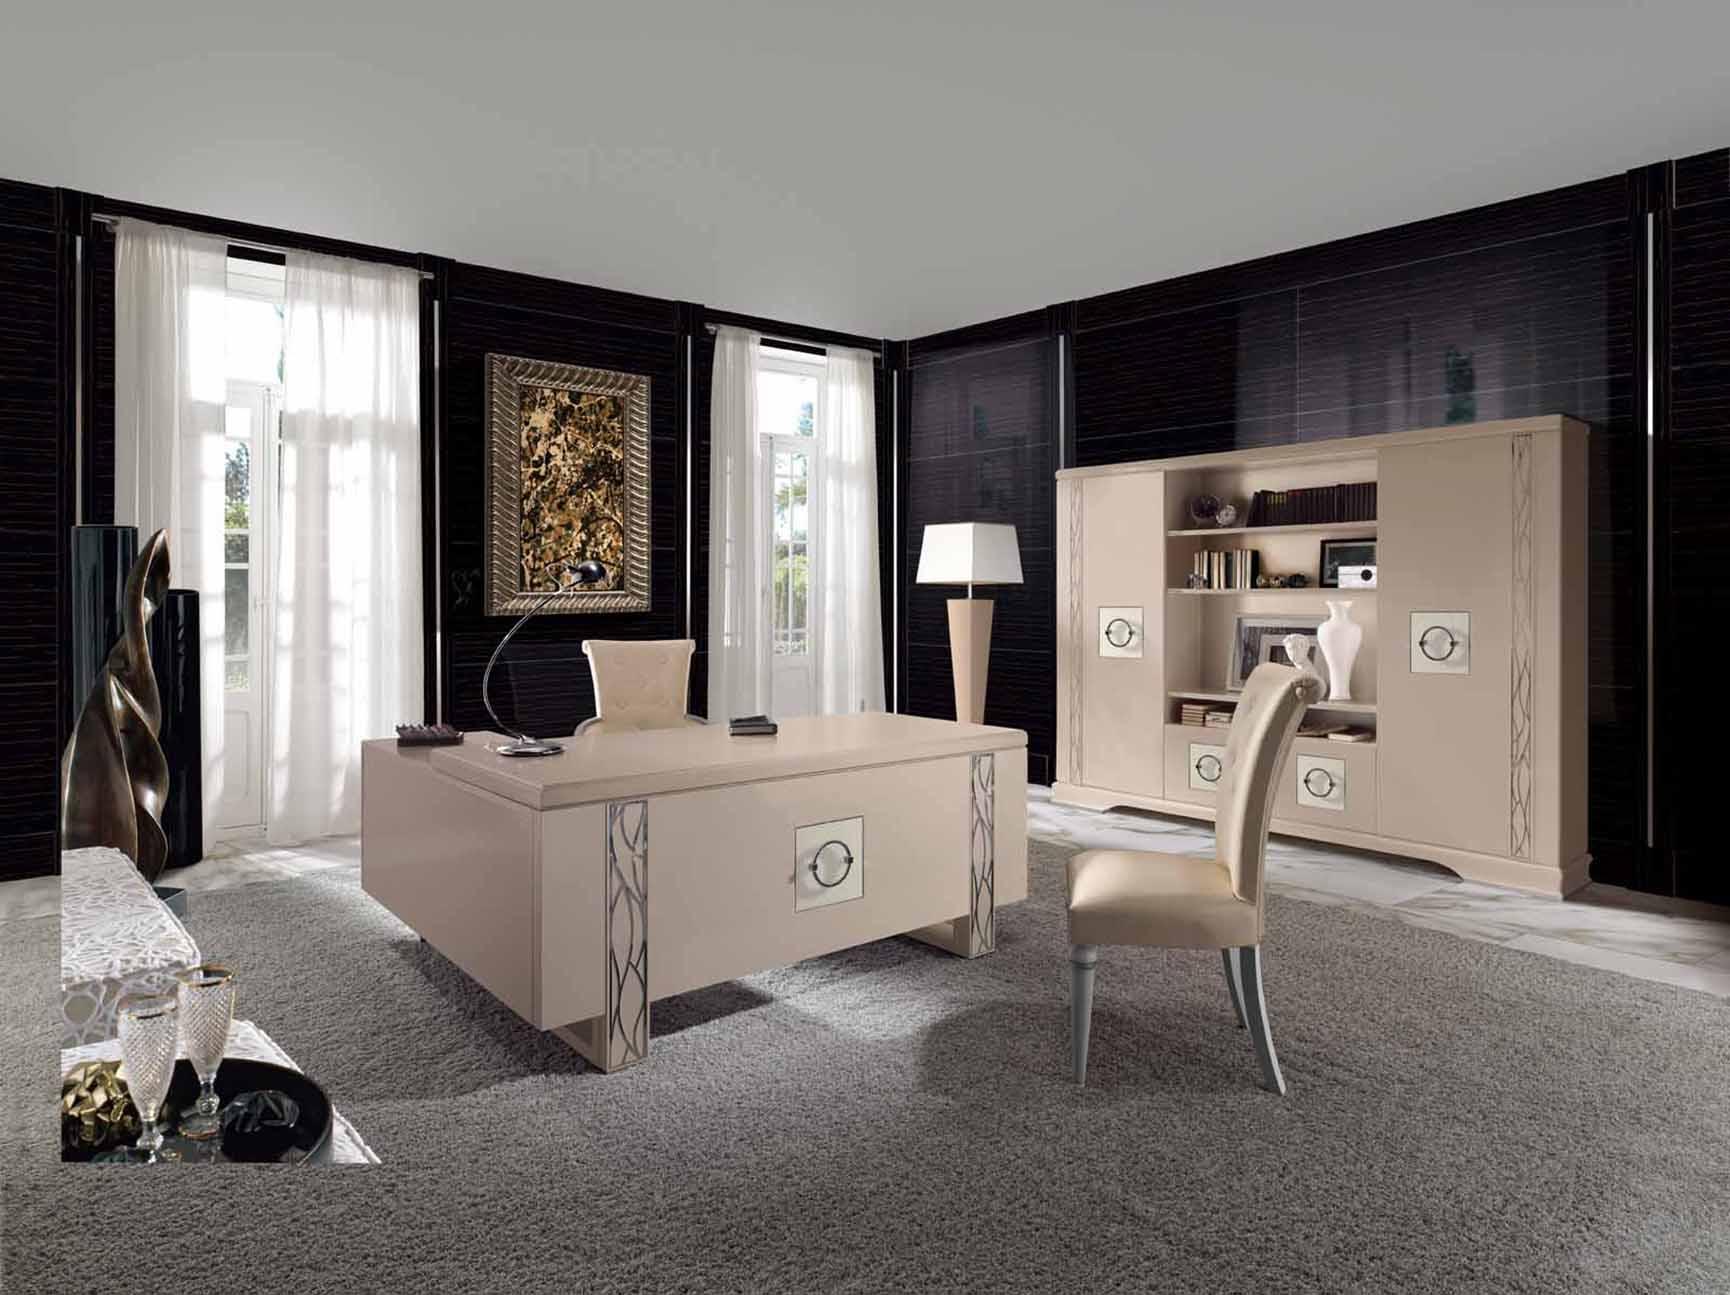 Modernios klasikos darbo kambario baldai Stravaganza 4